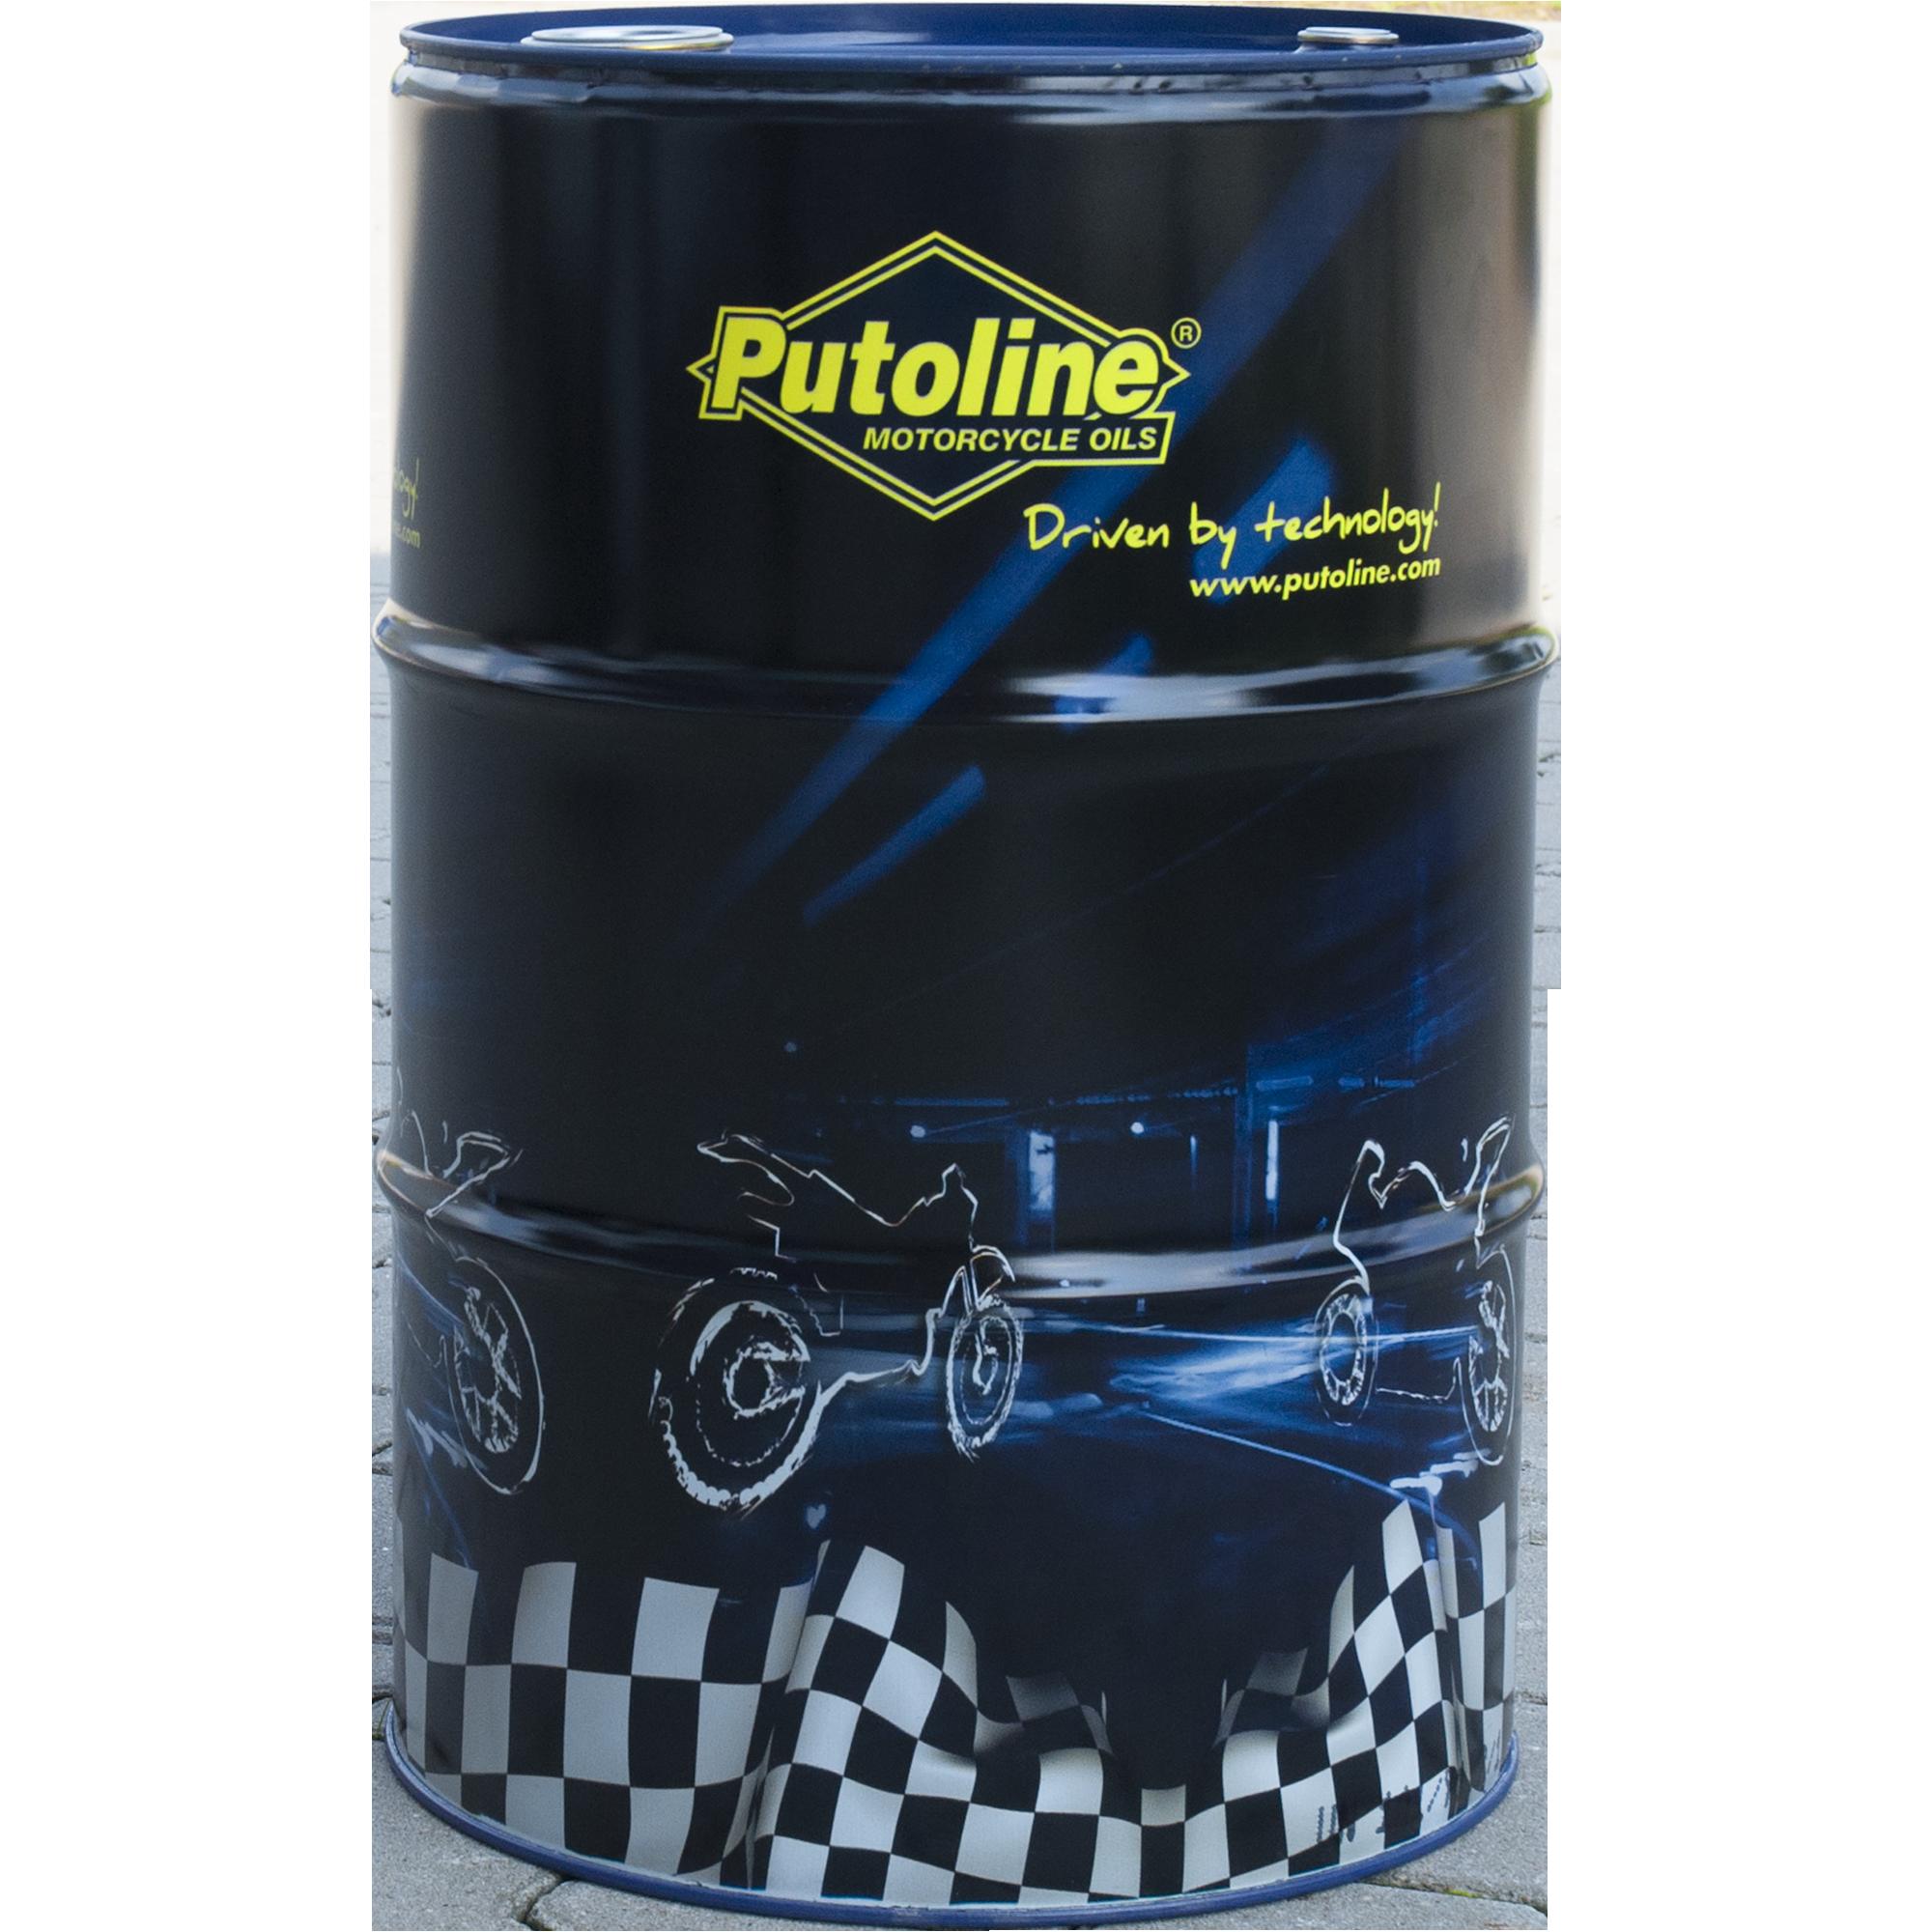 Putoline Motoröl Super DX4 20W-50 200L